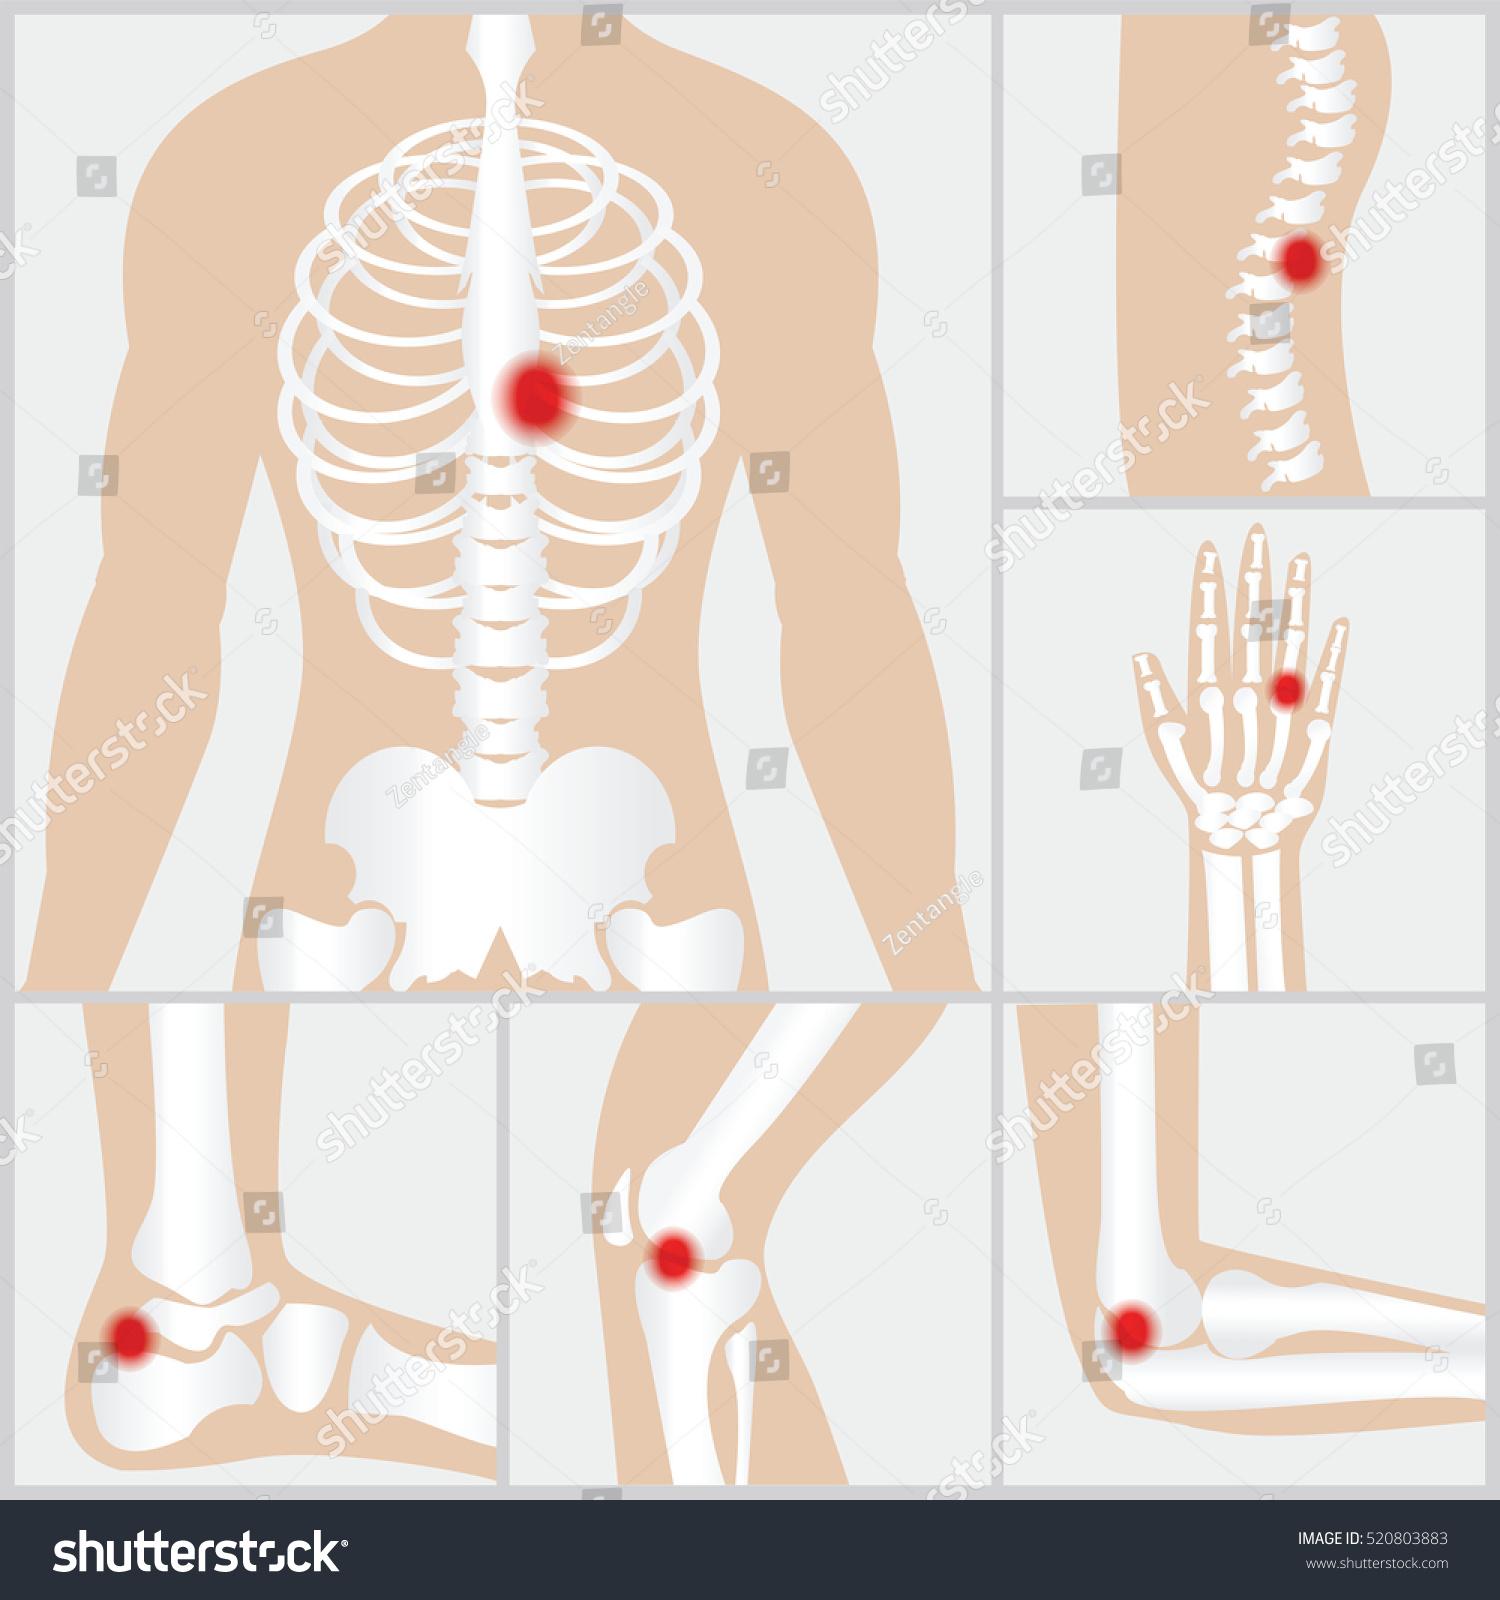 Disease Joints Boneshuman Joints Knee Joint Stock Vector Royalty